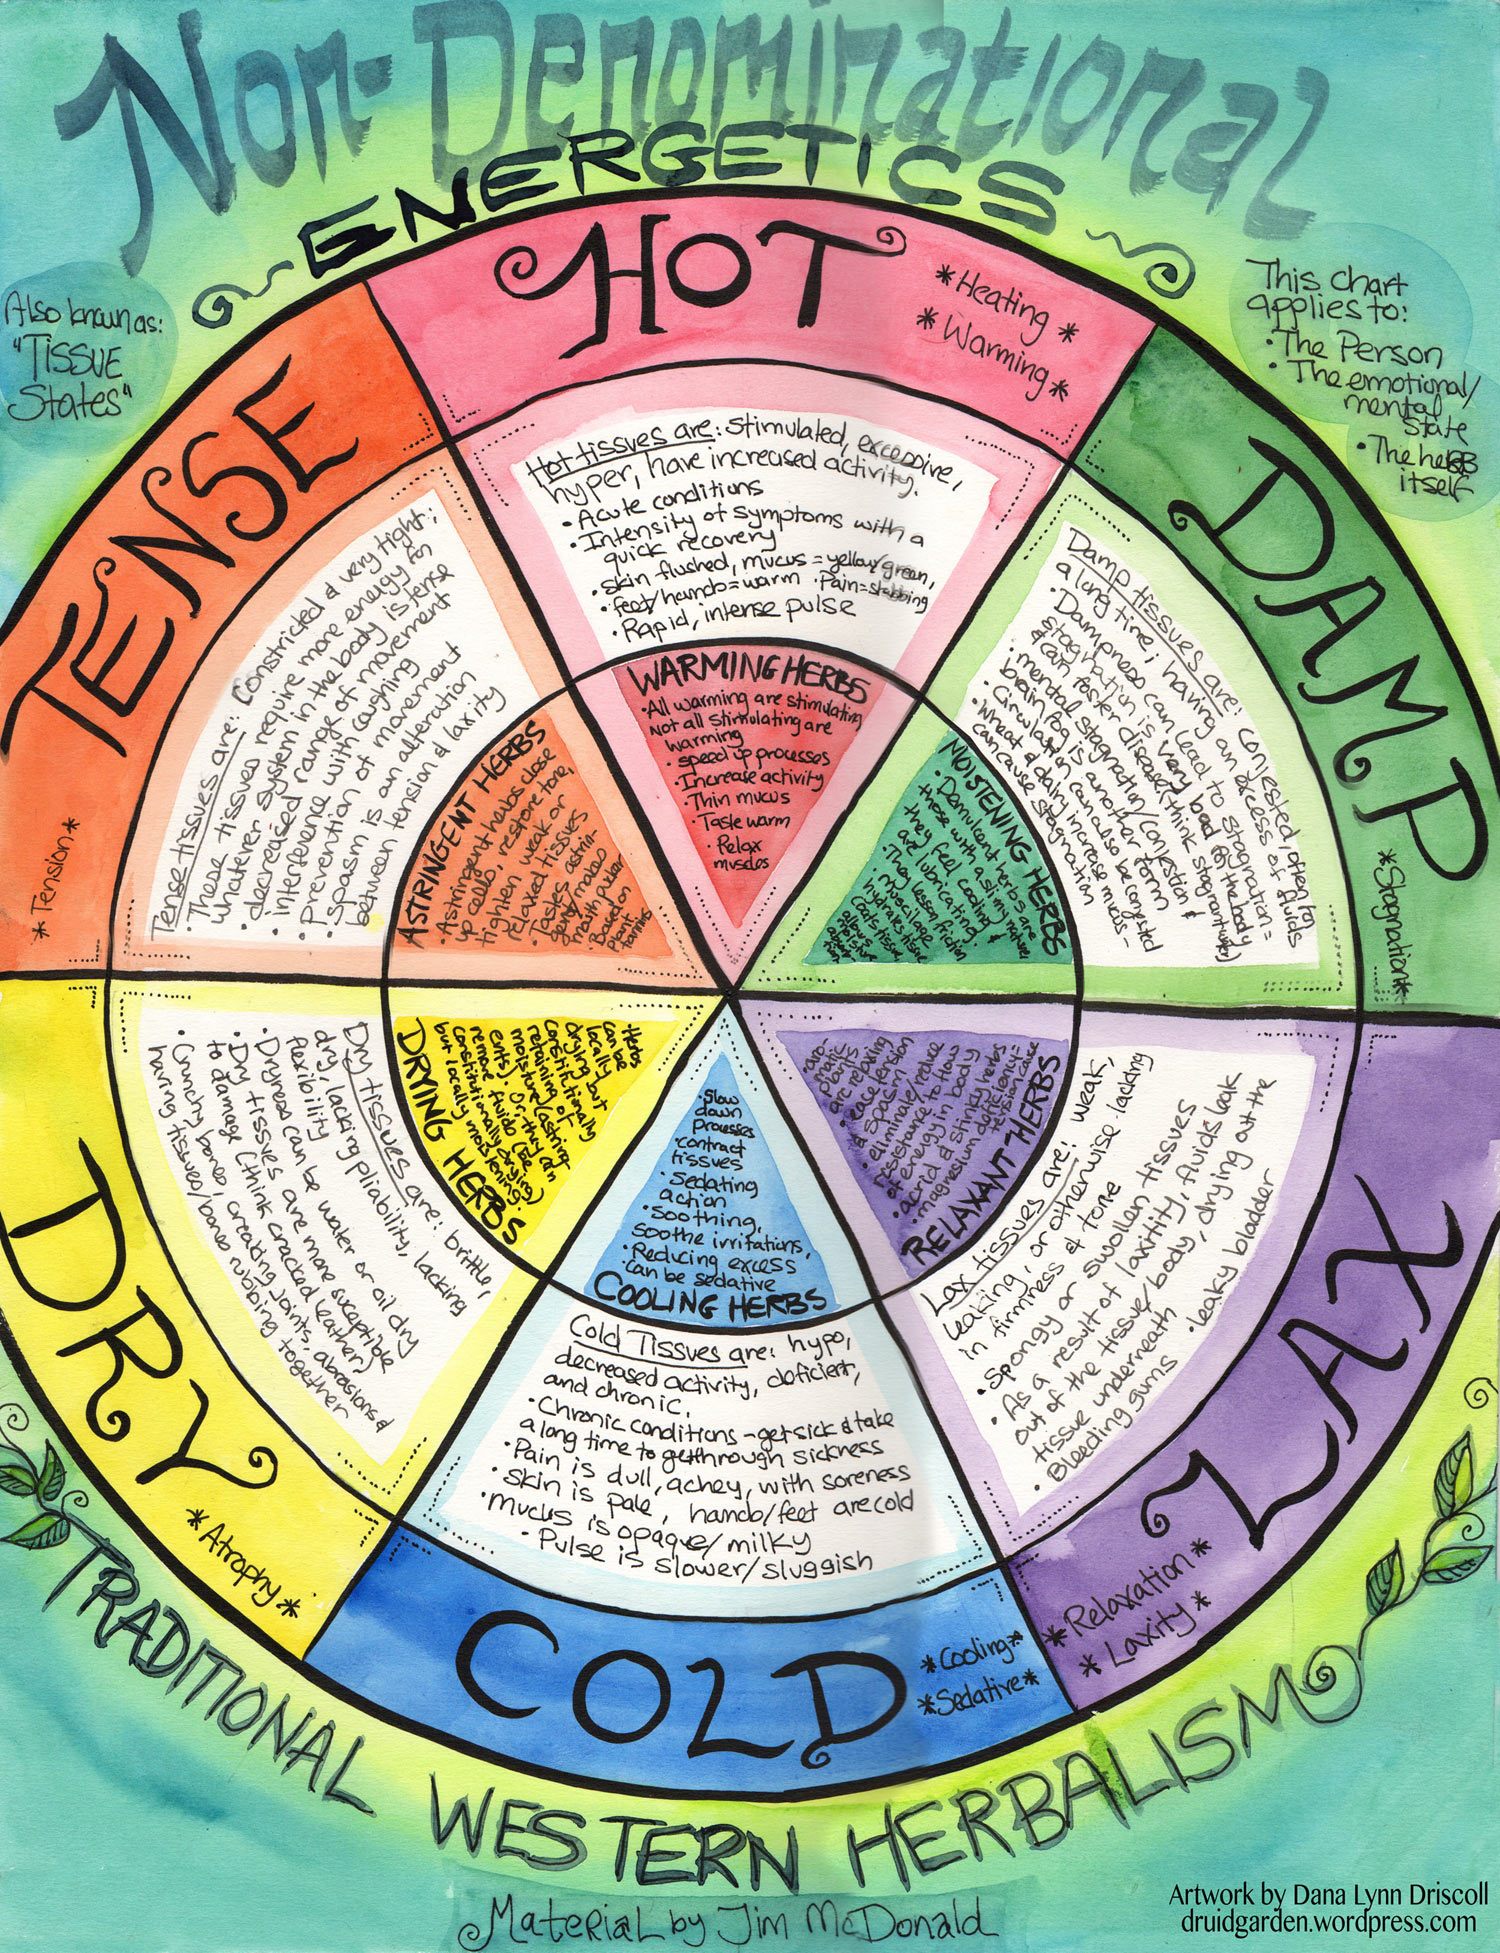 Energetics And Tissue States Wheel